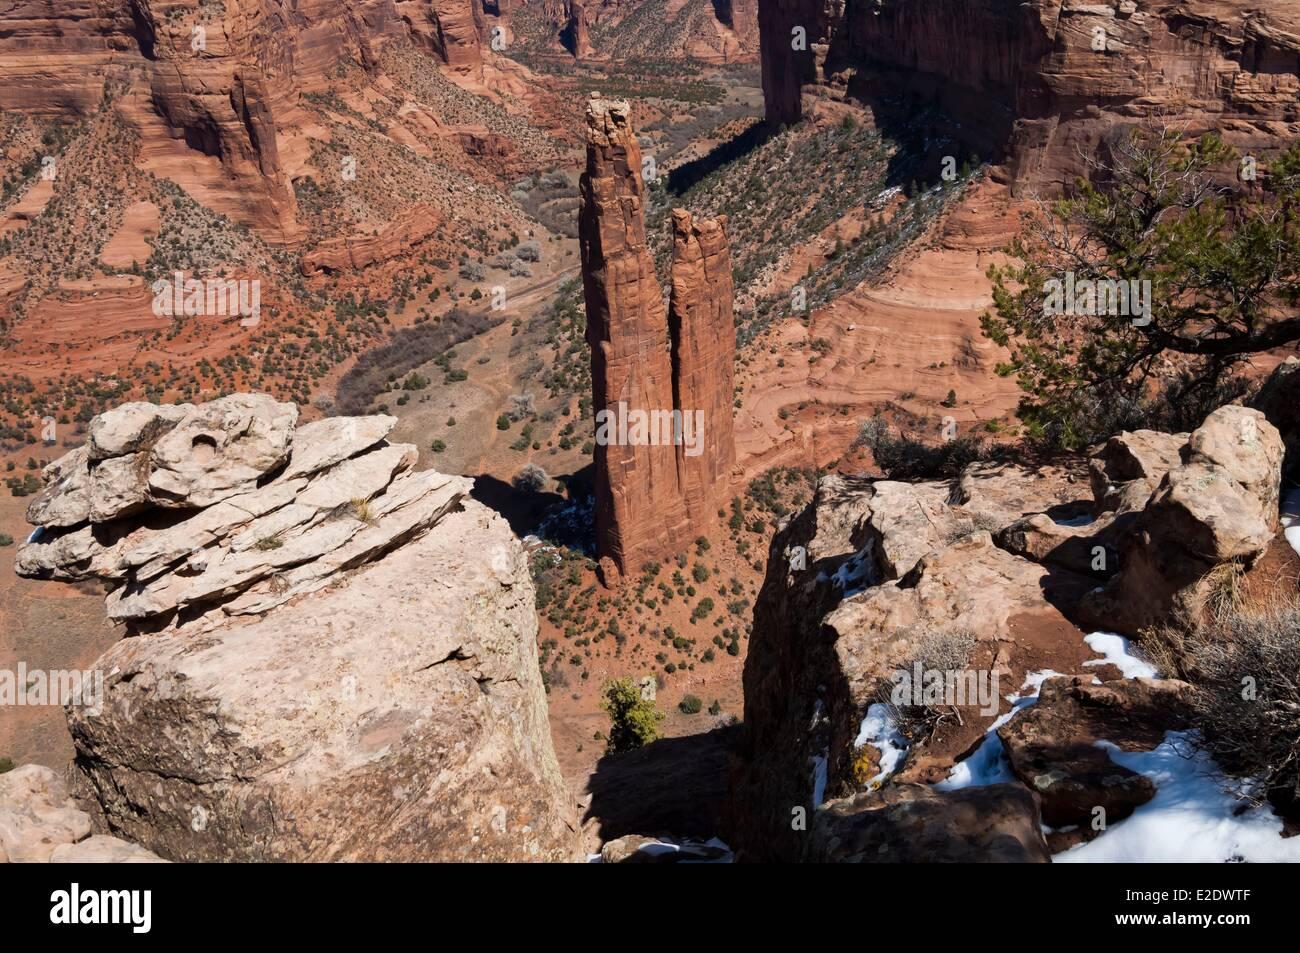 United States Arizona Canyon de Chelly National Monument - Stock Image